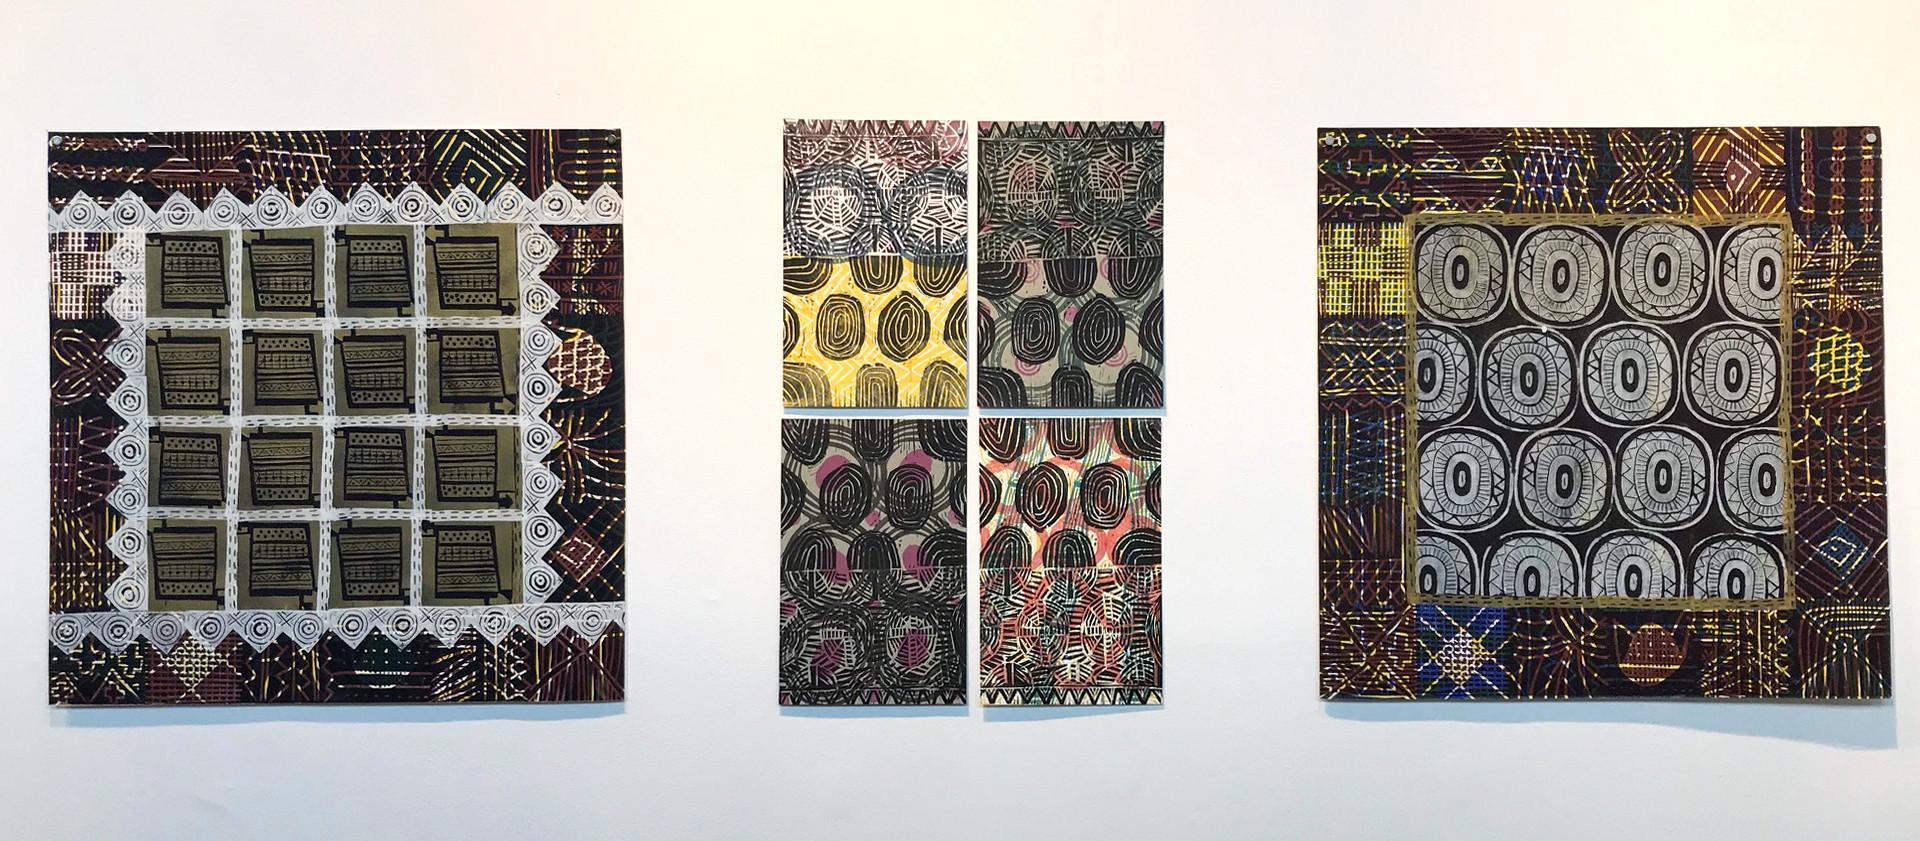 Gallery view, artist Sarah Matthews